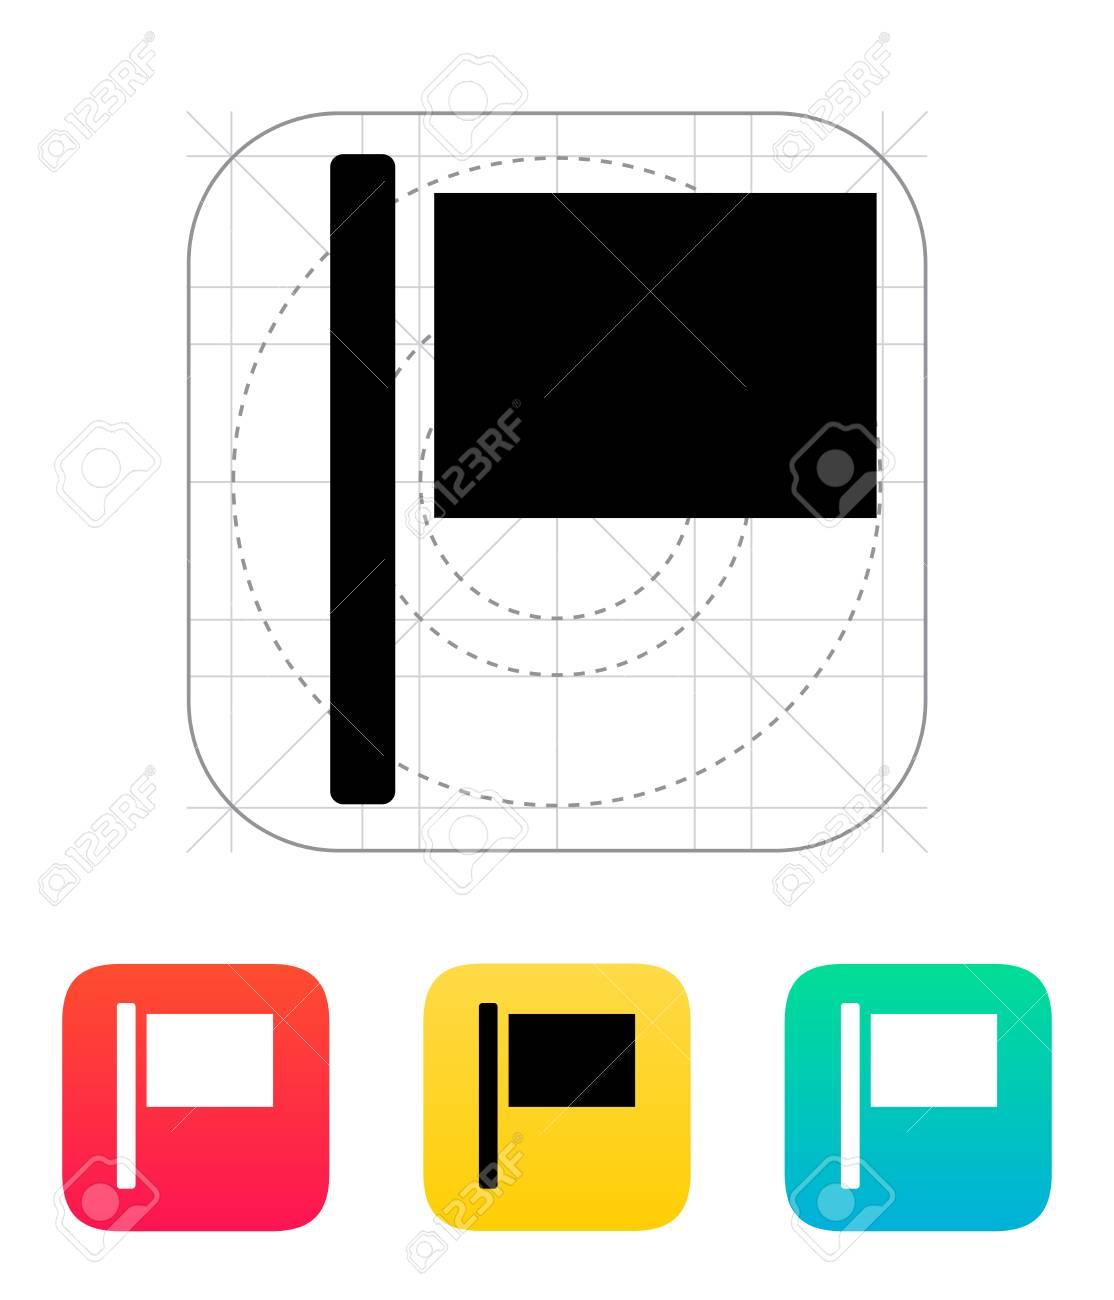 Flag icon. Vector illustration. Stock Vector - 22784708